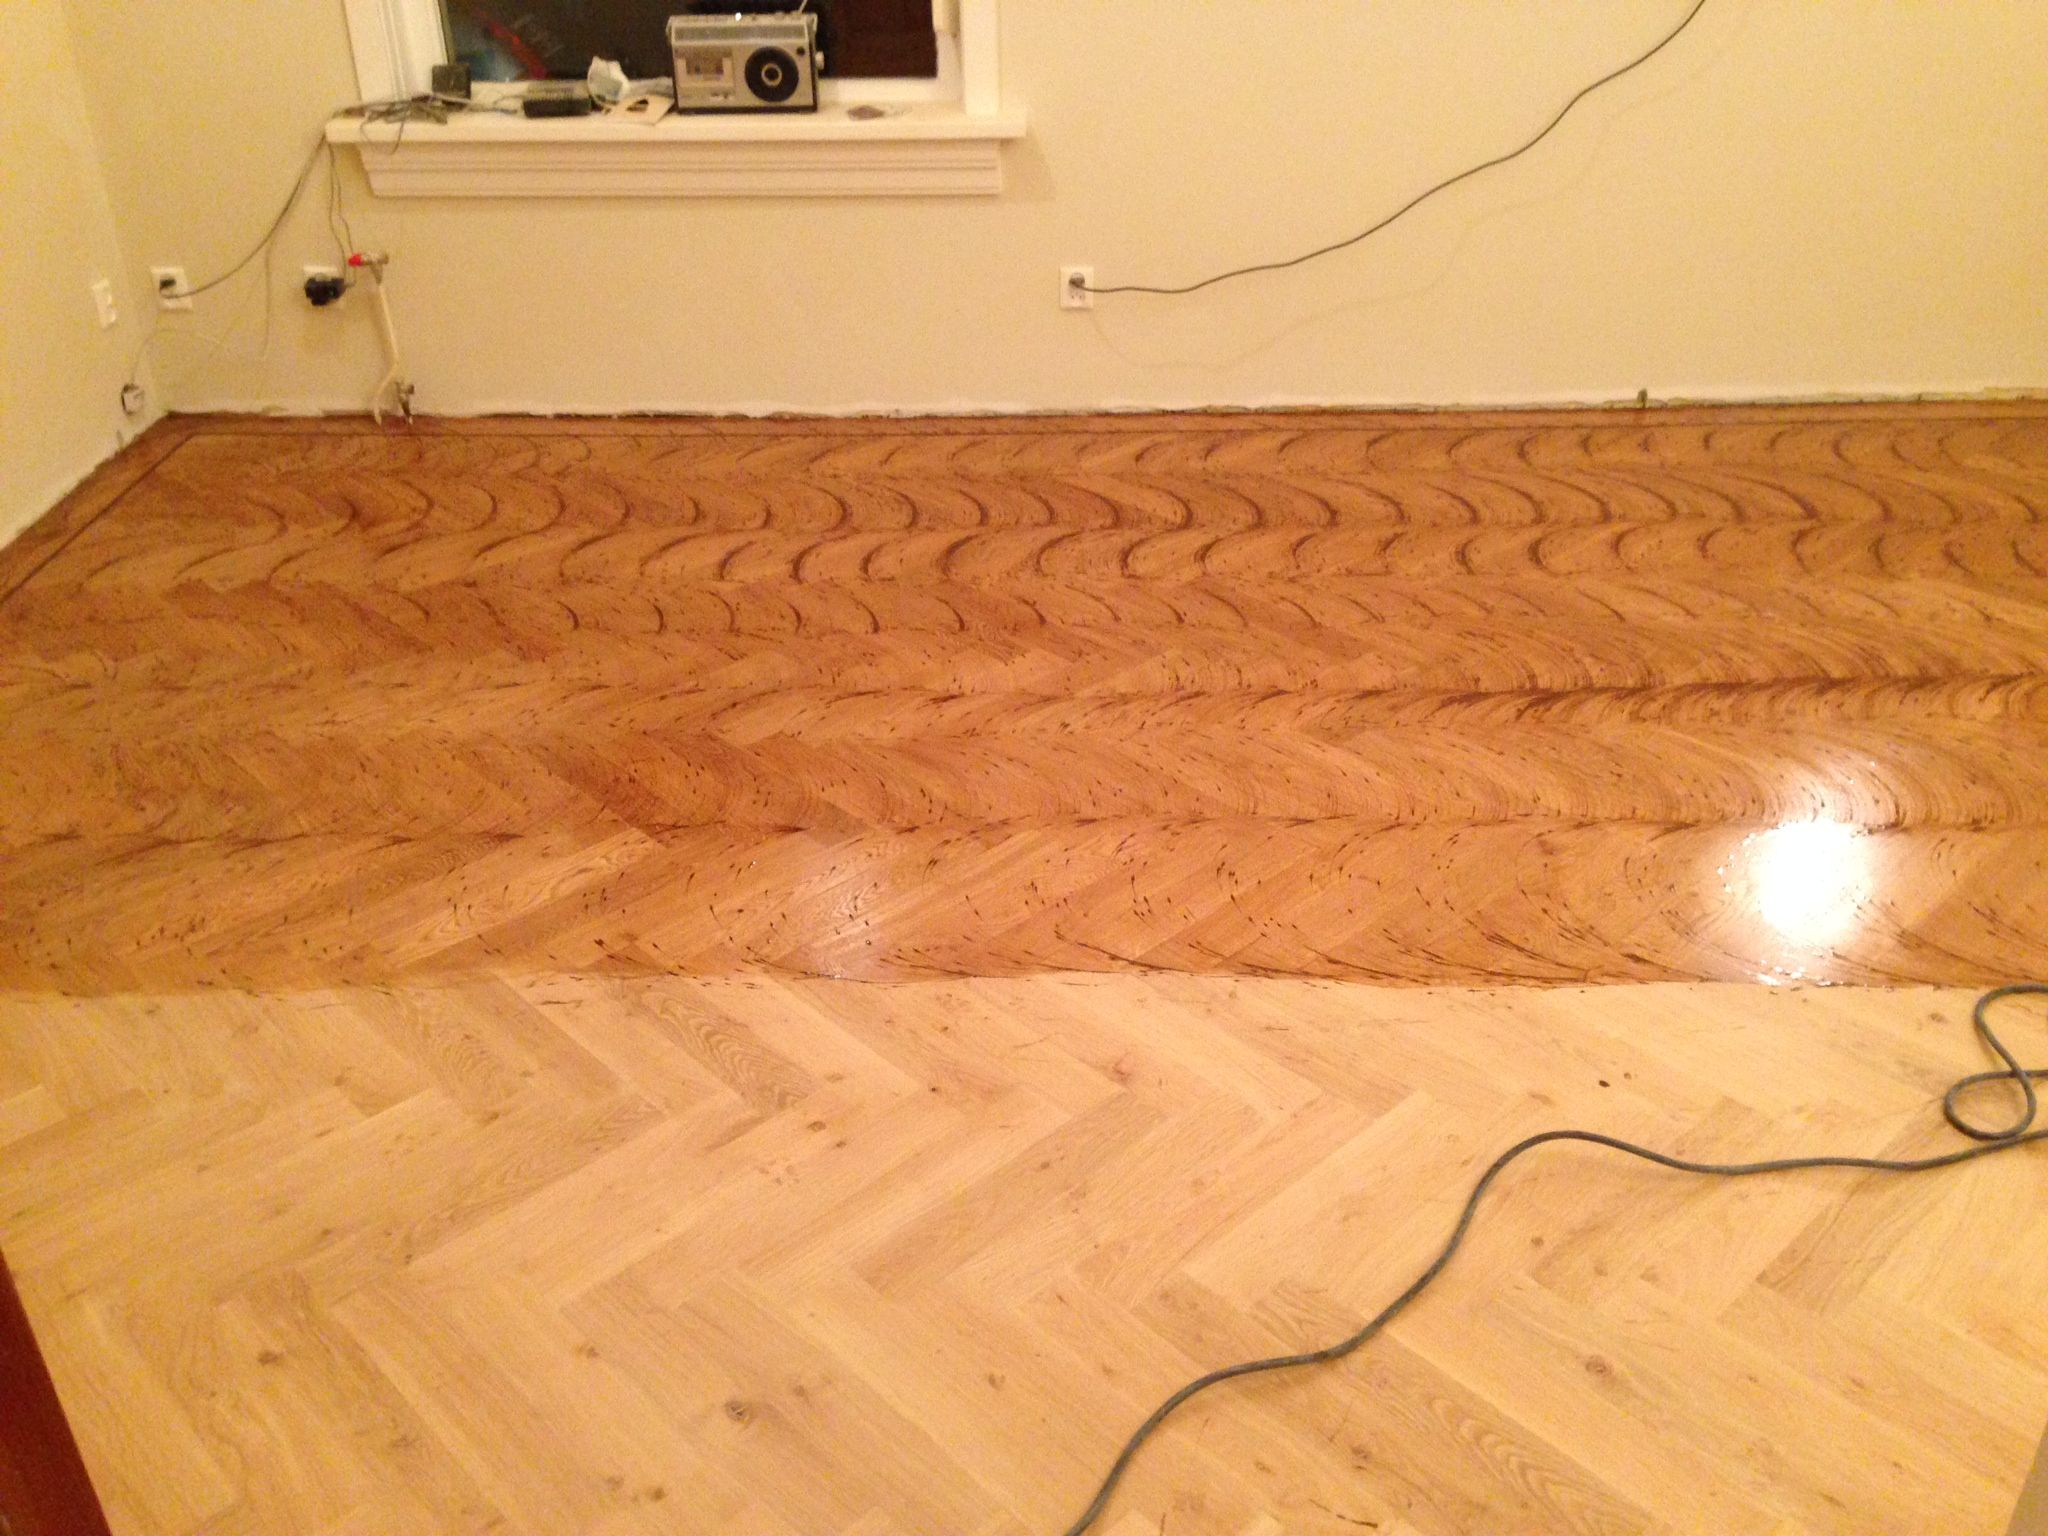 Vinyl Vloer Visgraat : Pvc vloeren in visgraatvorm dino tapijt